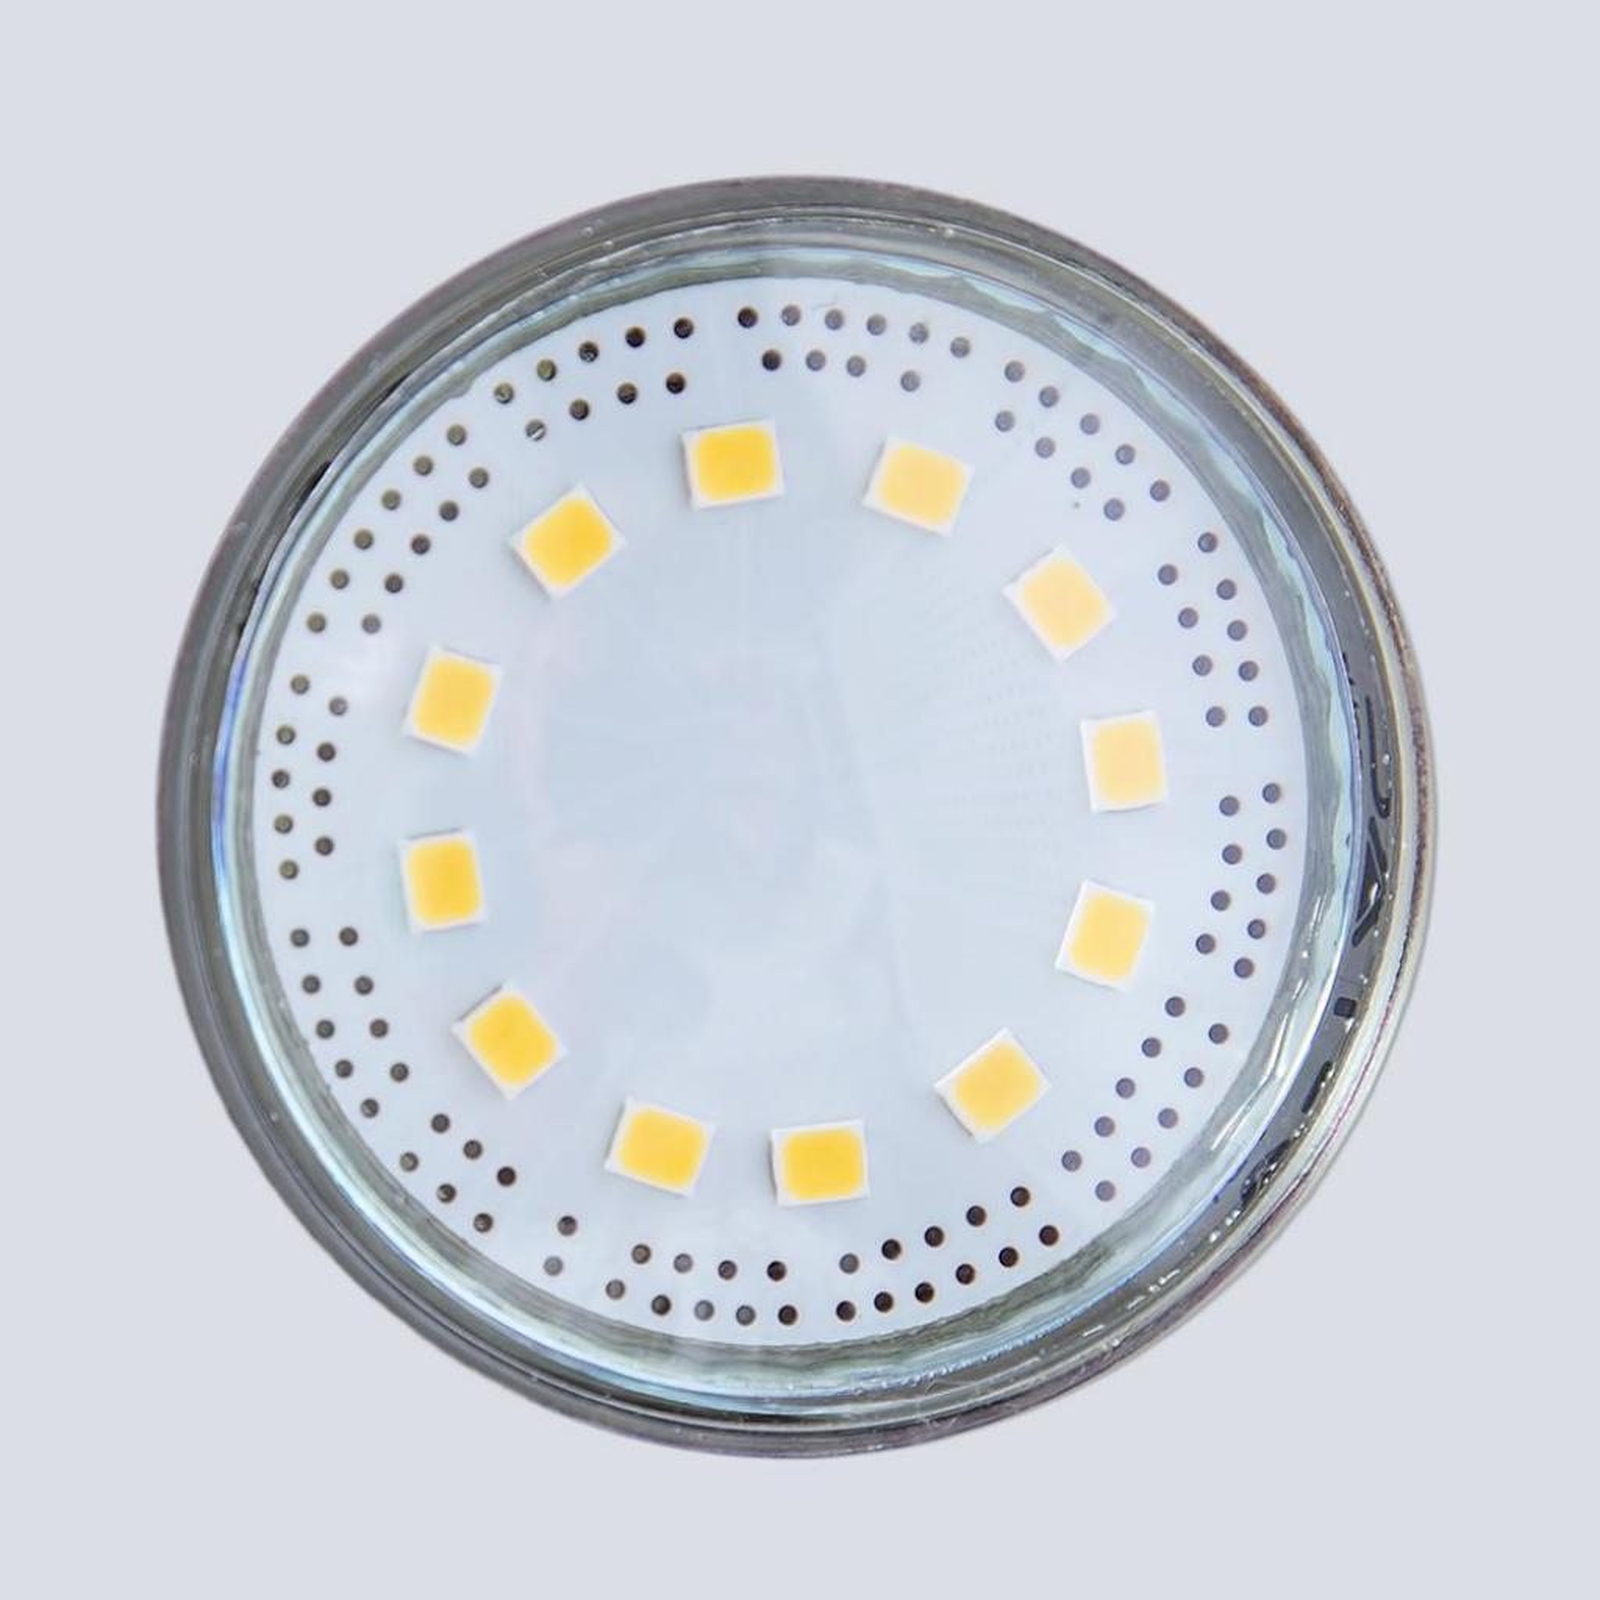 Вытяжка кухонная PERFELLI TL 6632 A 1000 W GLASS изображение 7